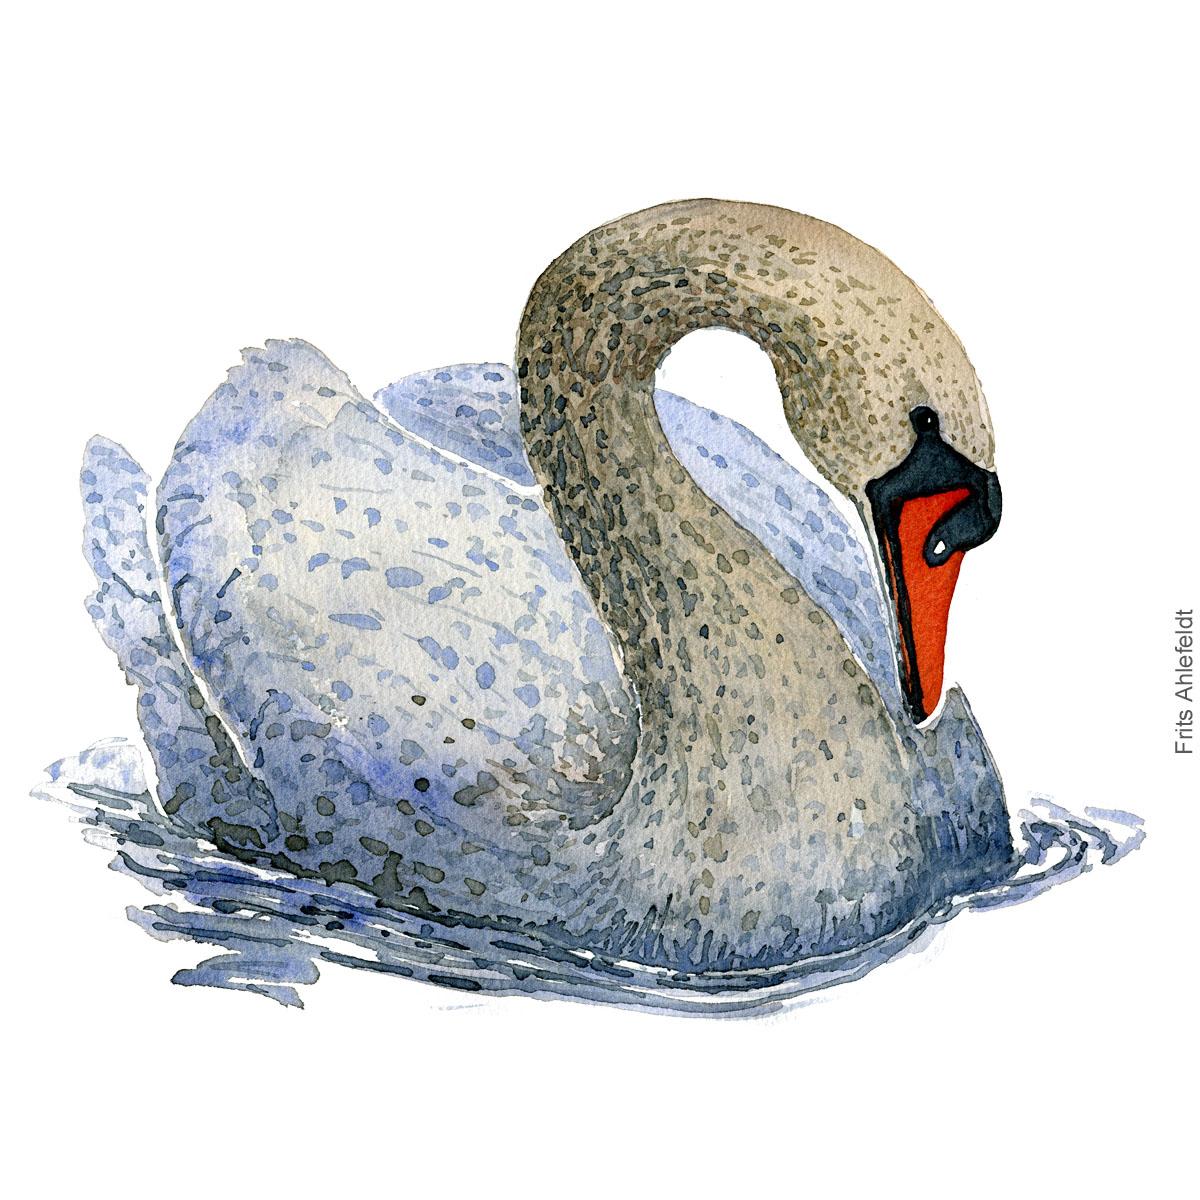 Mute swan swimming - Knopsvane akvarel. Watercolor painting by Frits Ahlefeldt